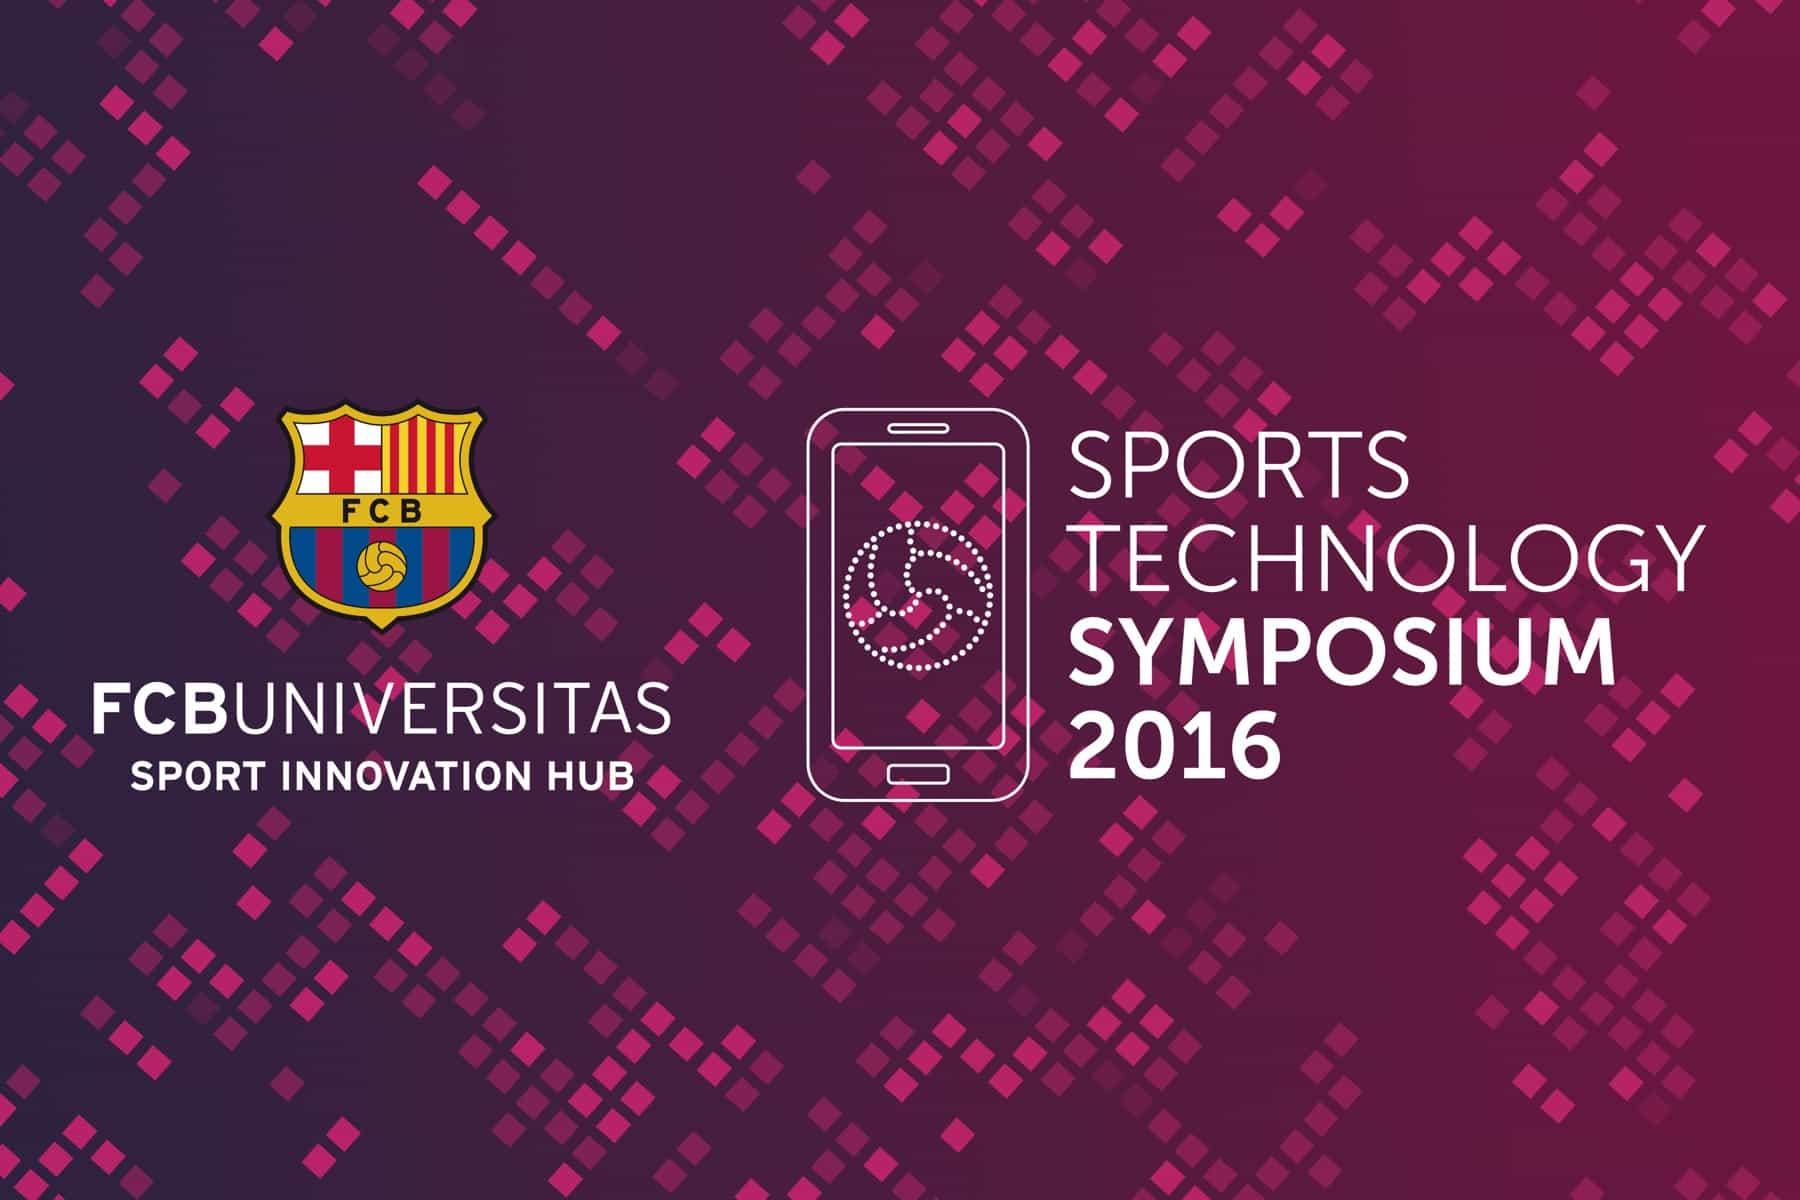 fcb-sports-technology-symposium-2016-logo